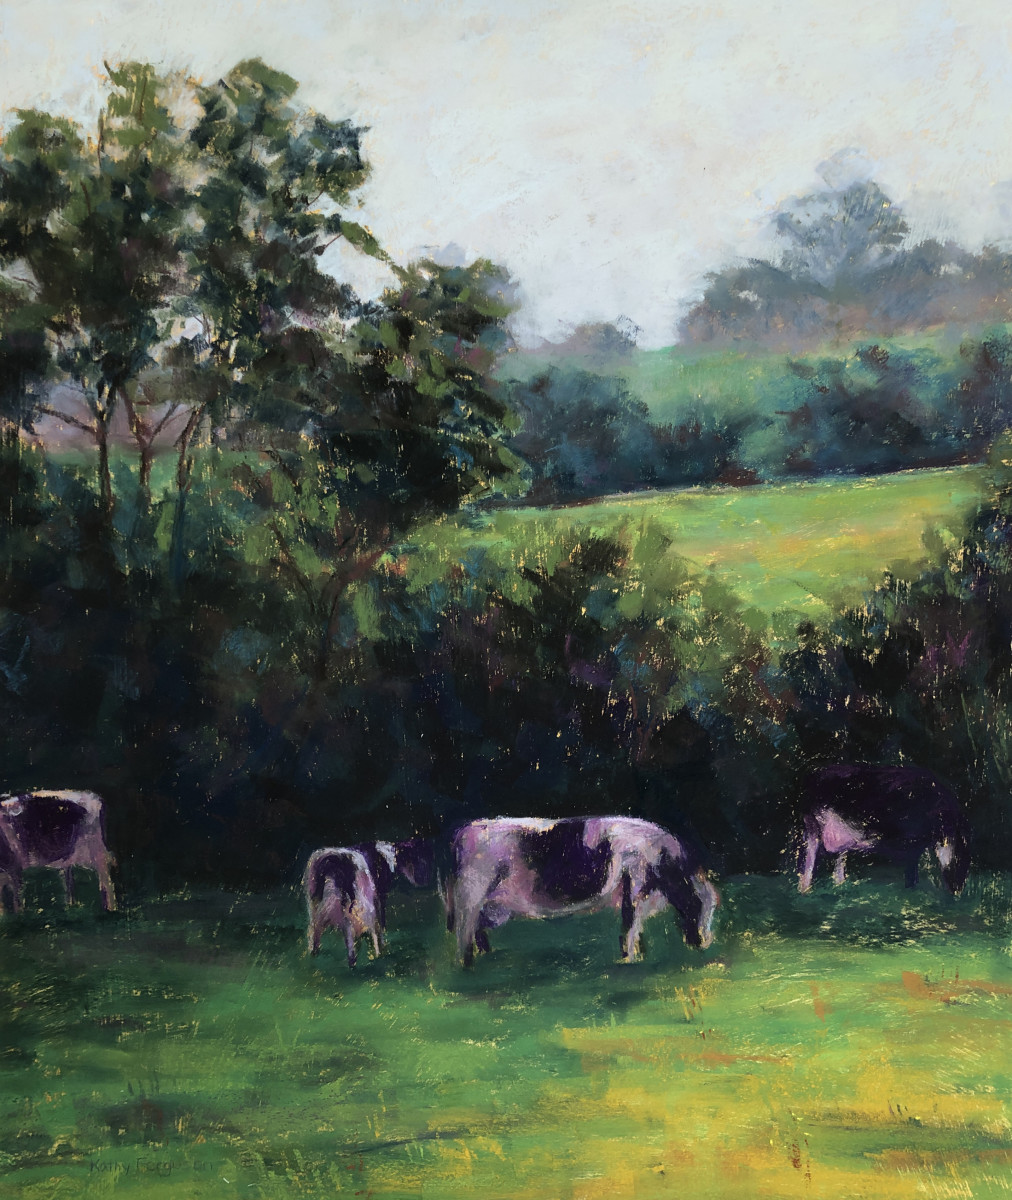 Summer Pastures by Kathy Ferguson